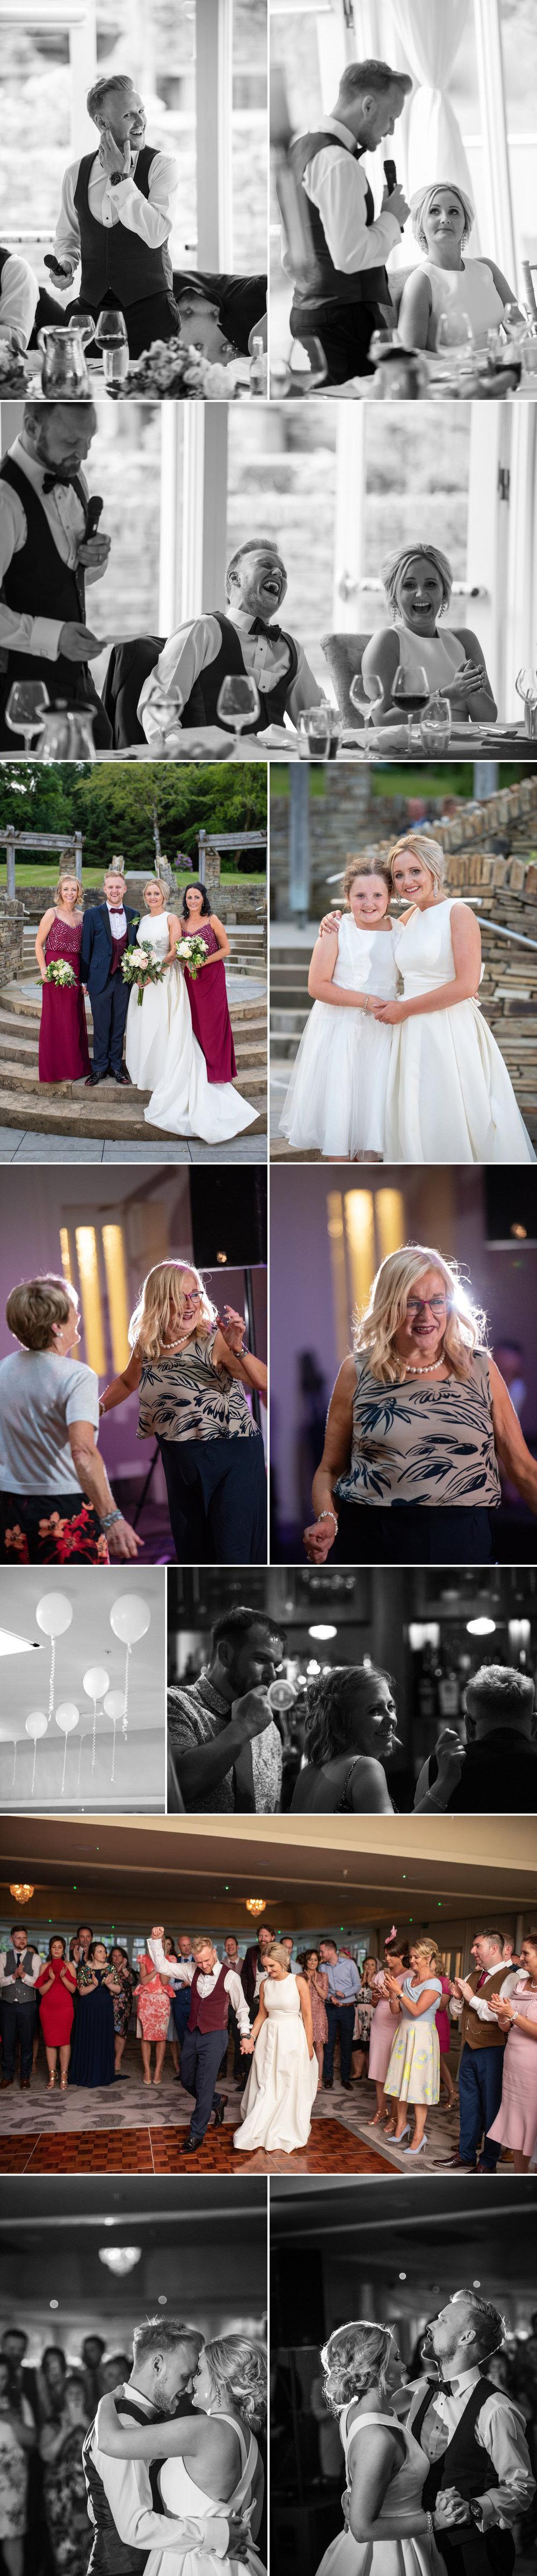 best wedding photographers northern ireland 17.jpg